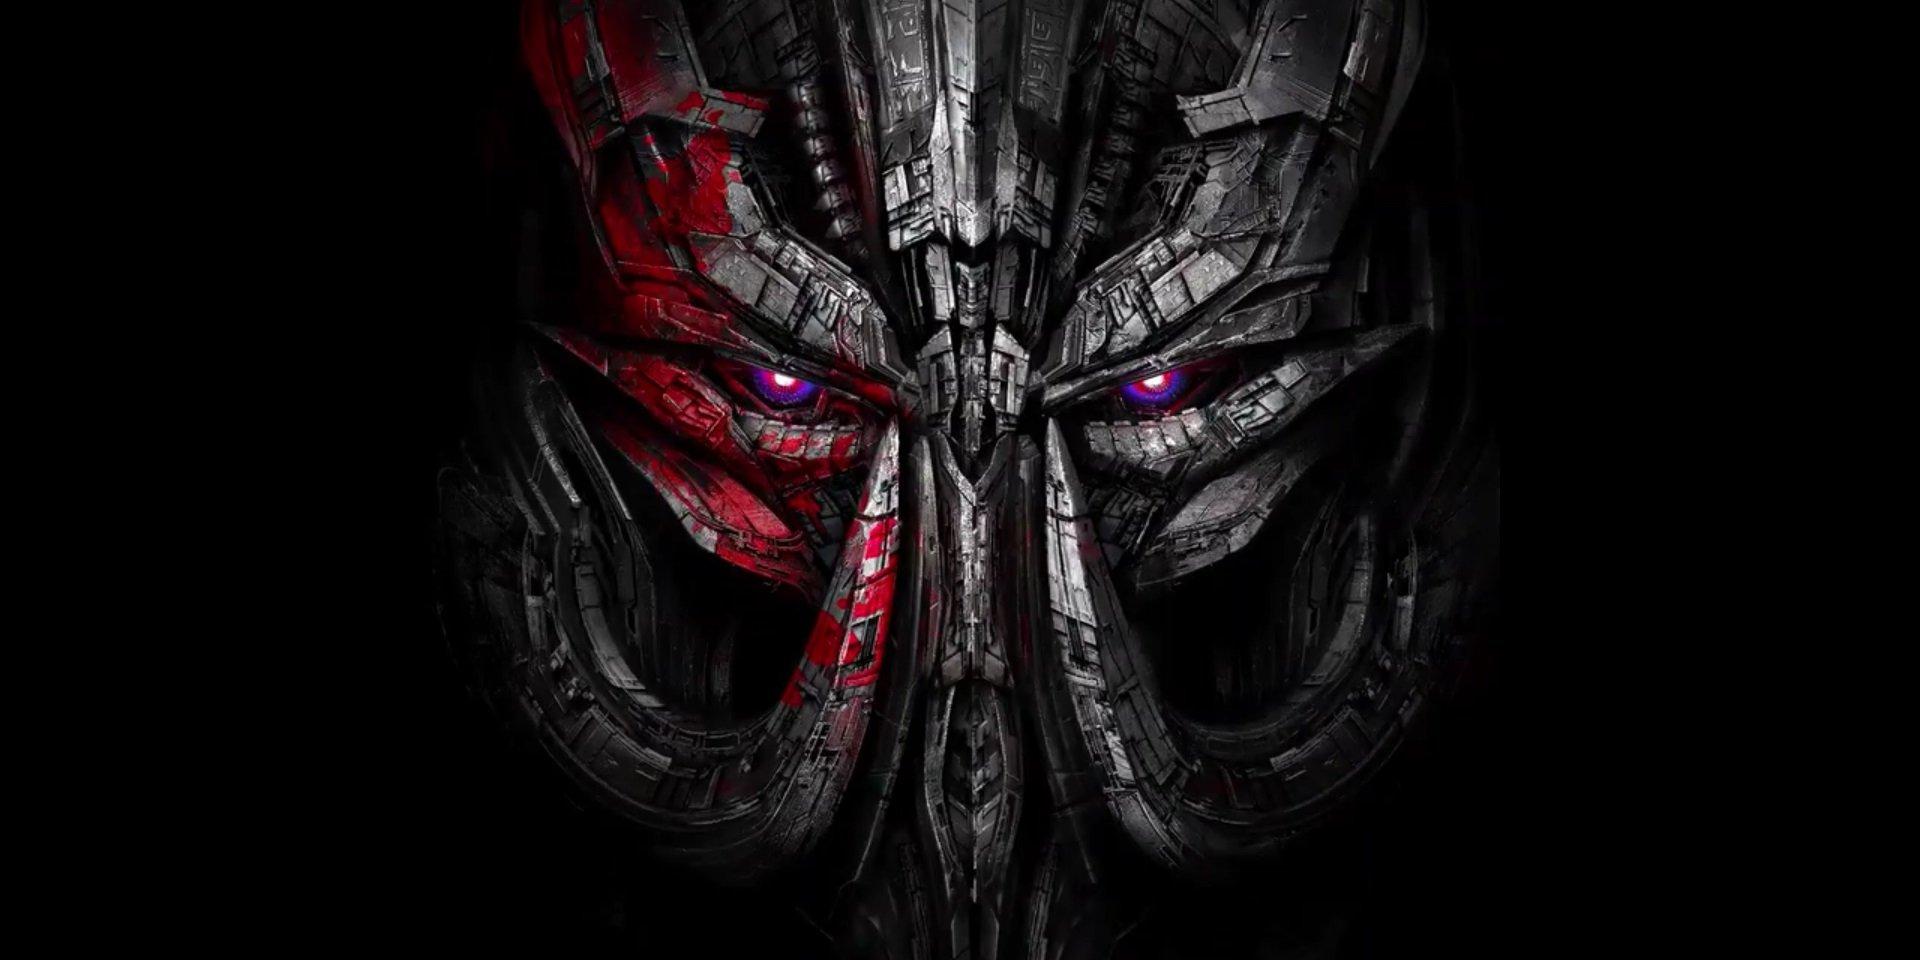 4k Hdr Wallpaper Iphone X Fondos De Transformers 5 El Ultimo Caballero The Last